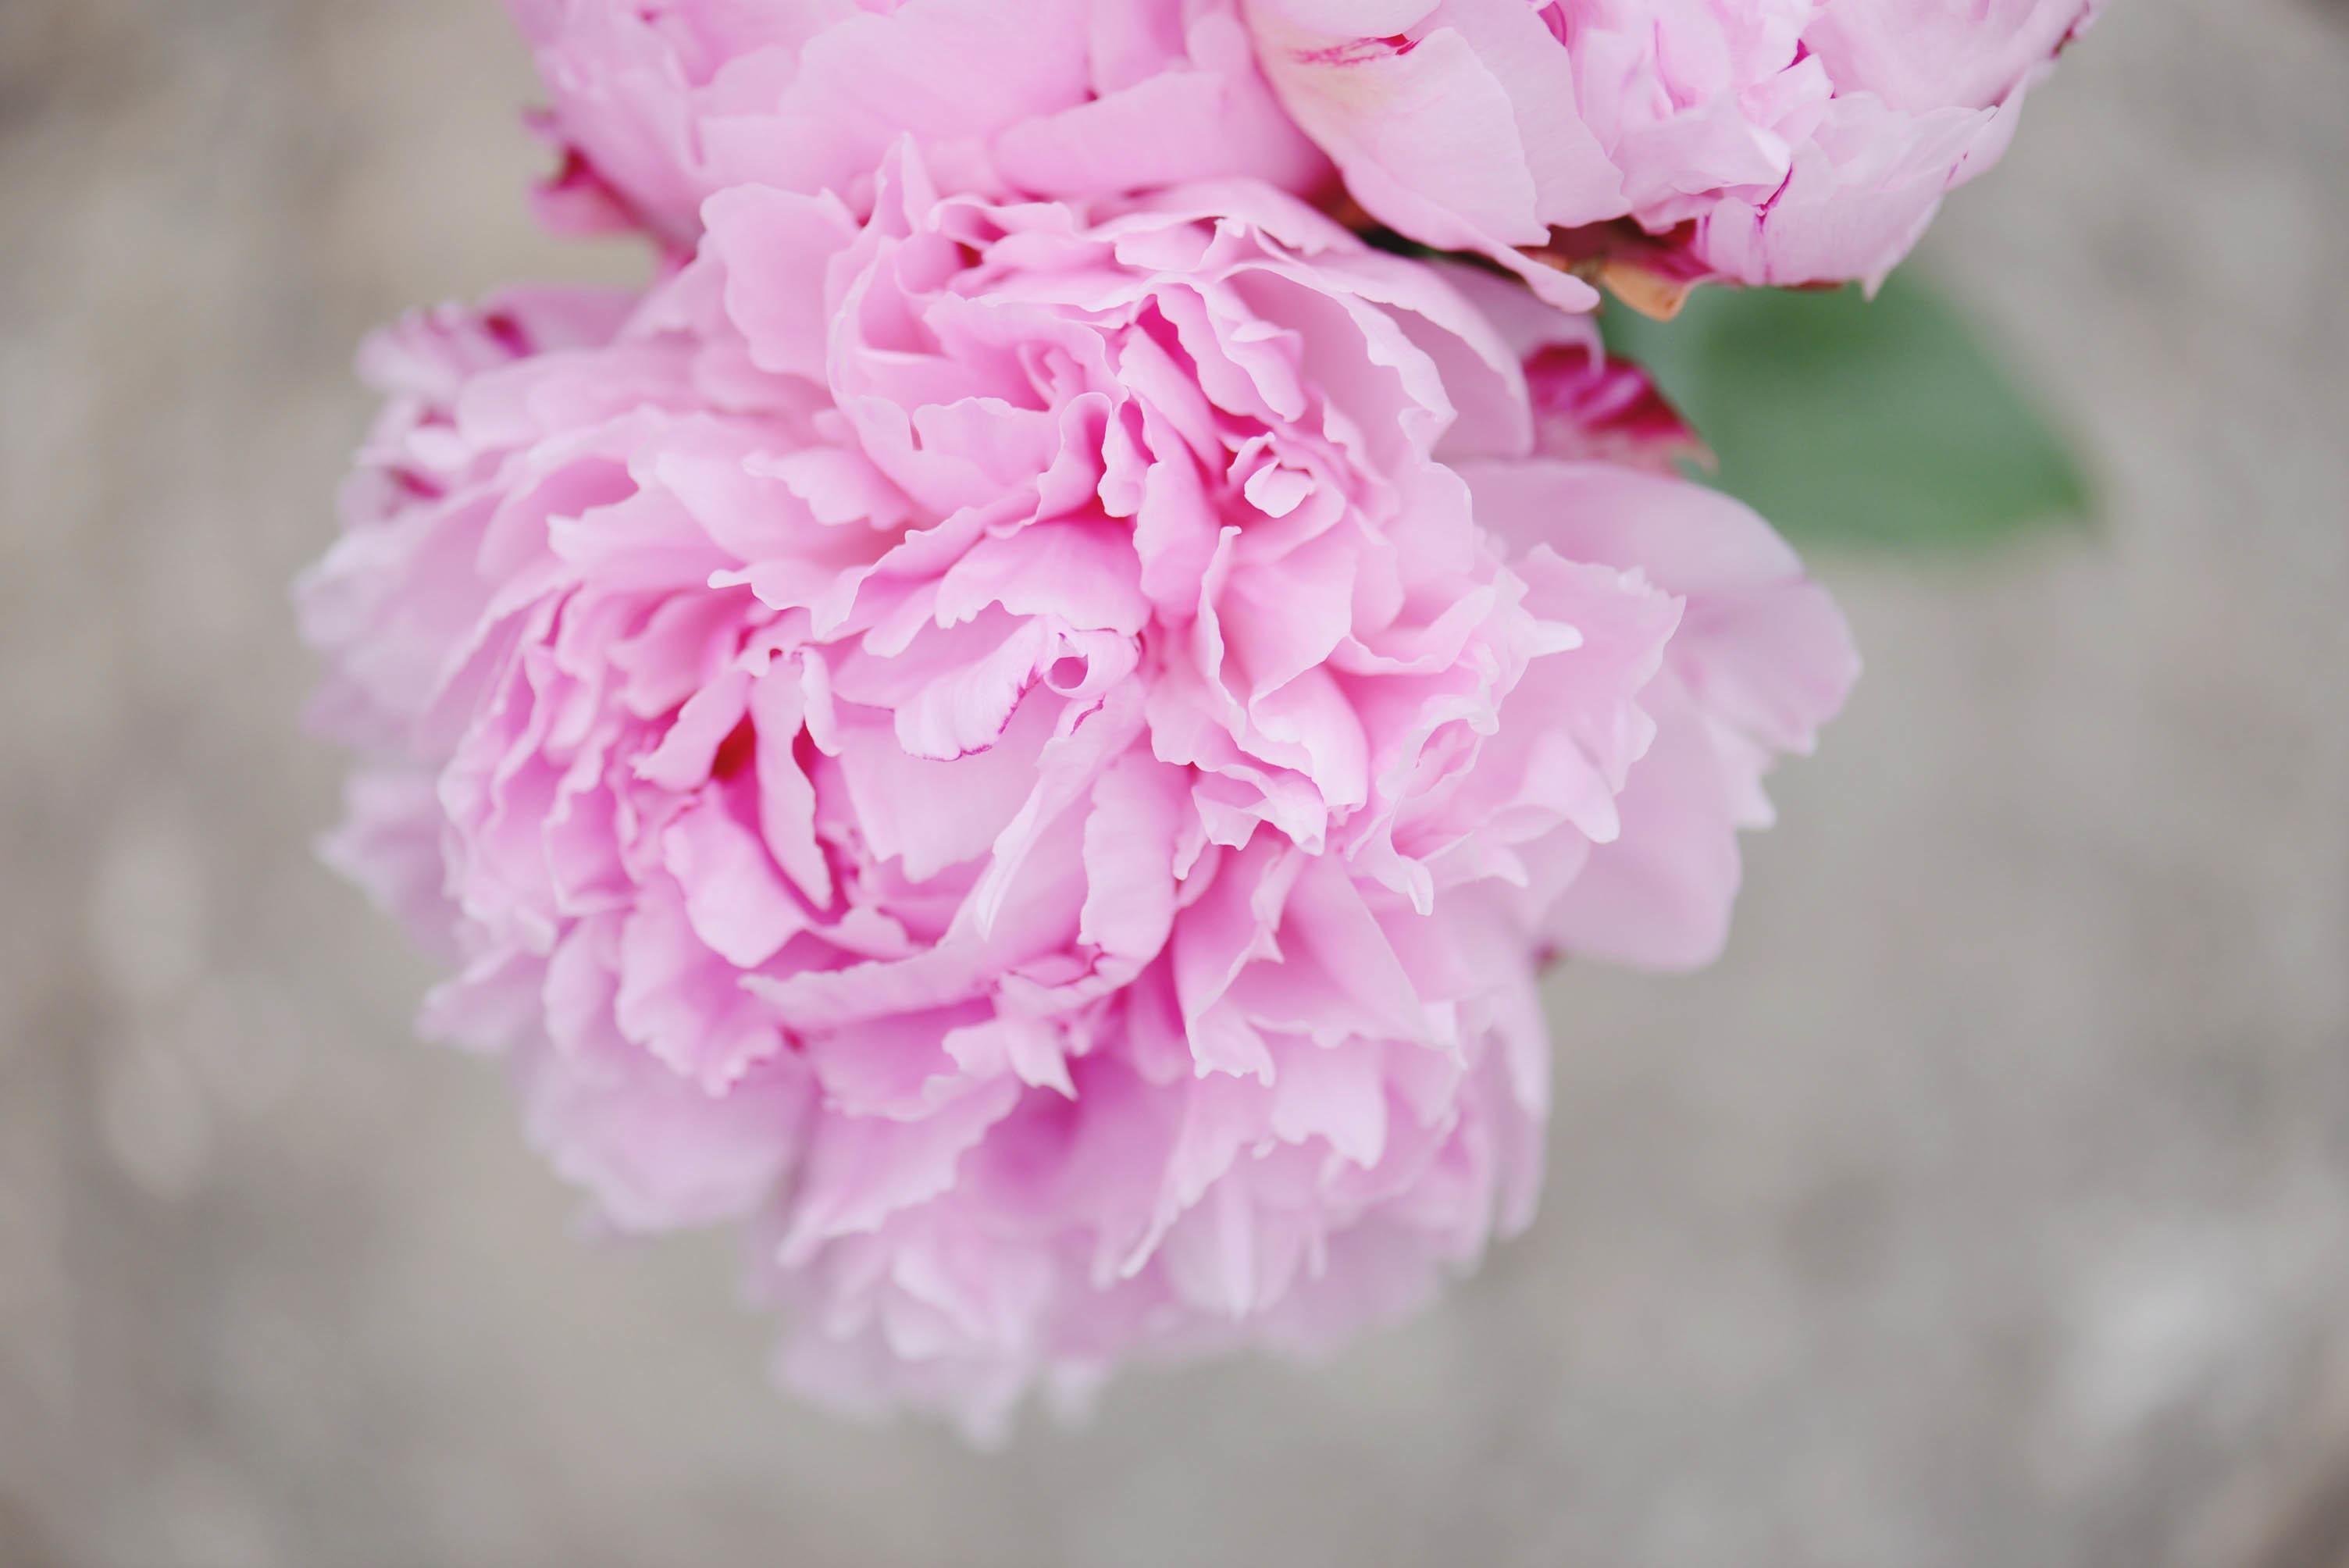 Картинки с розовыми пионами